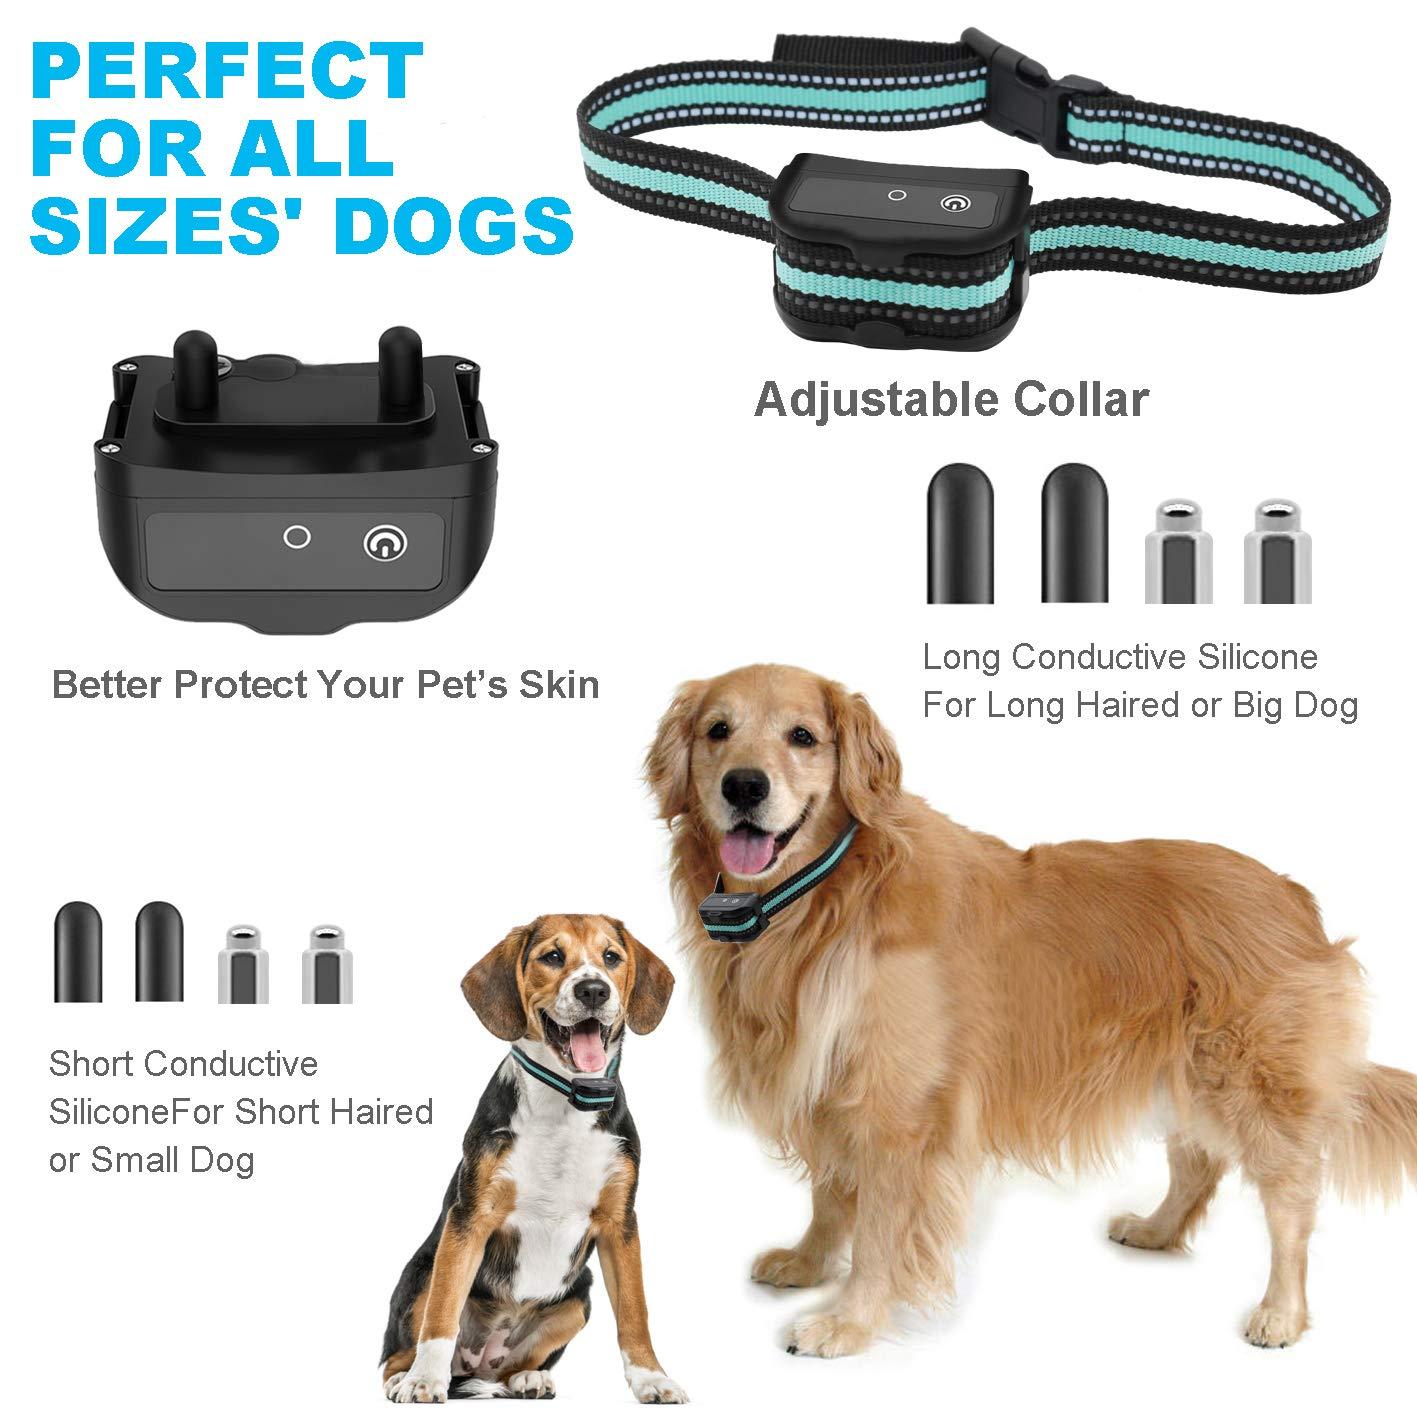 BESTHING Dog Training Collar, Dog Shock Collar, 3 Training Modes, Beep Vibra Electric Shock, Up to 1450Ft Remote Range, 1-100 Levels Waterproof Dog Training Set for Small Medium Large Dogs